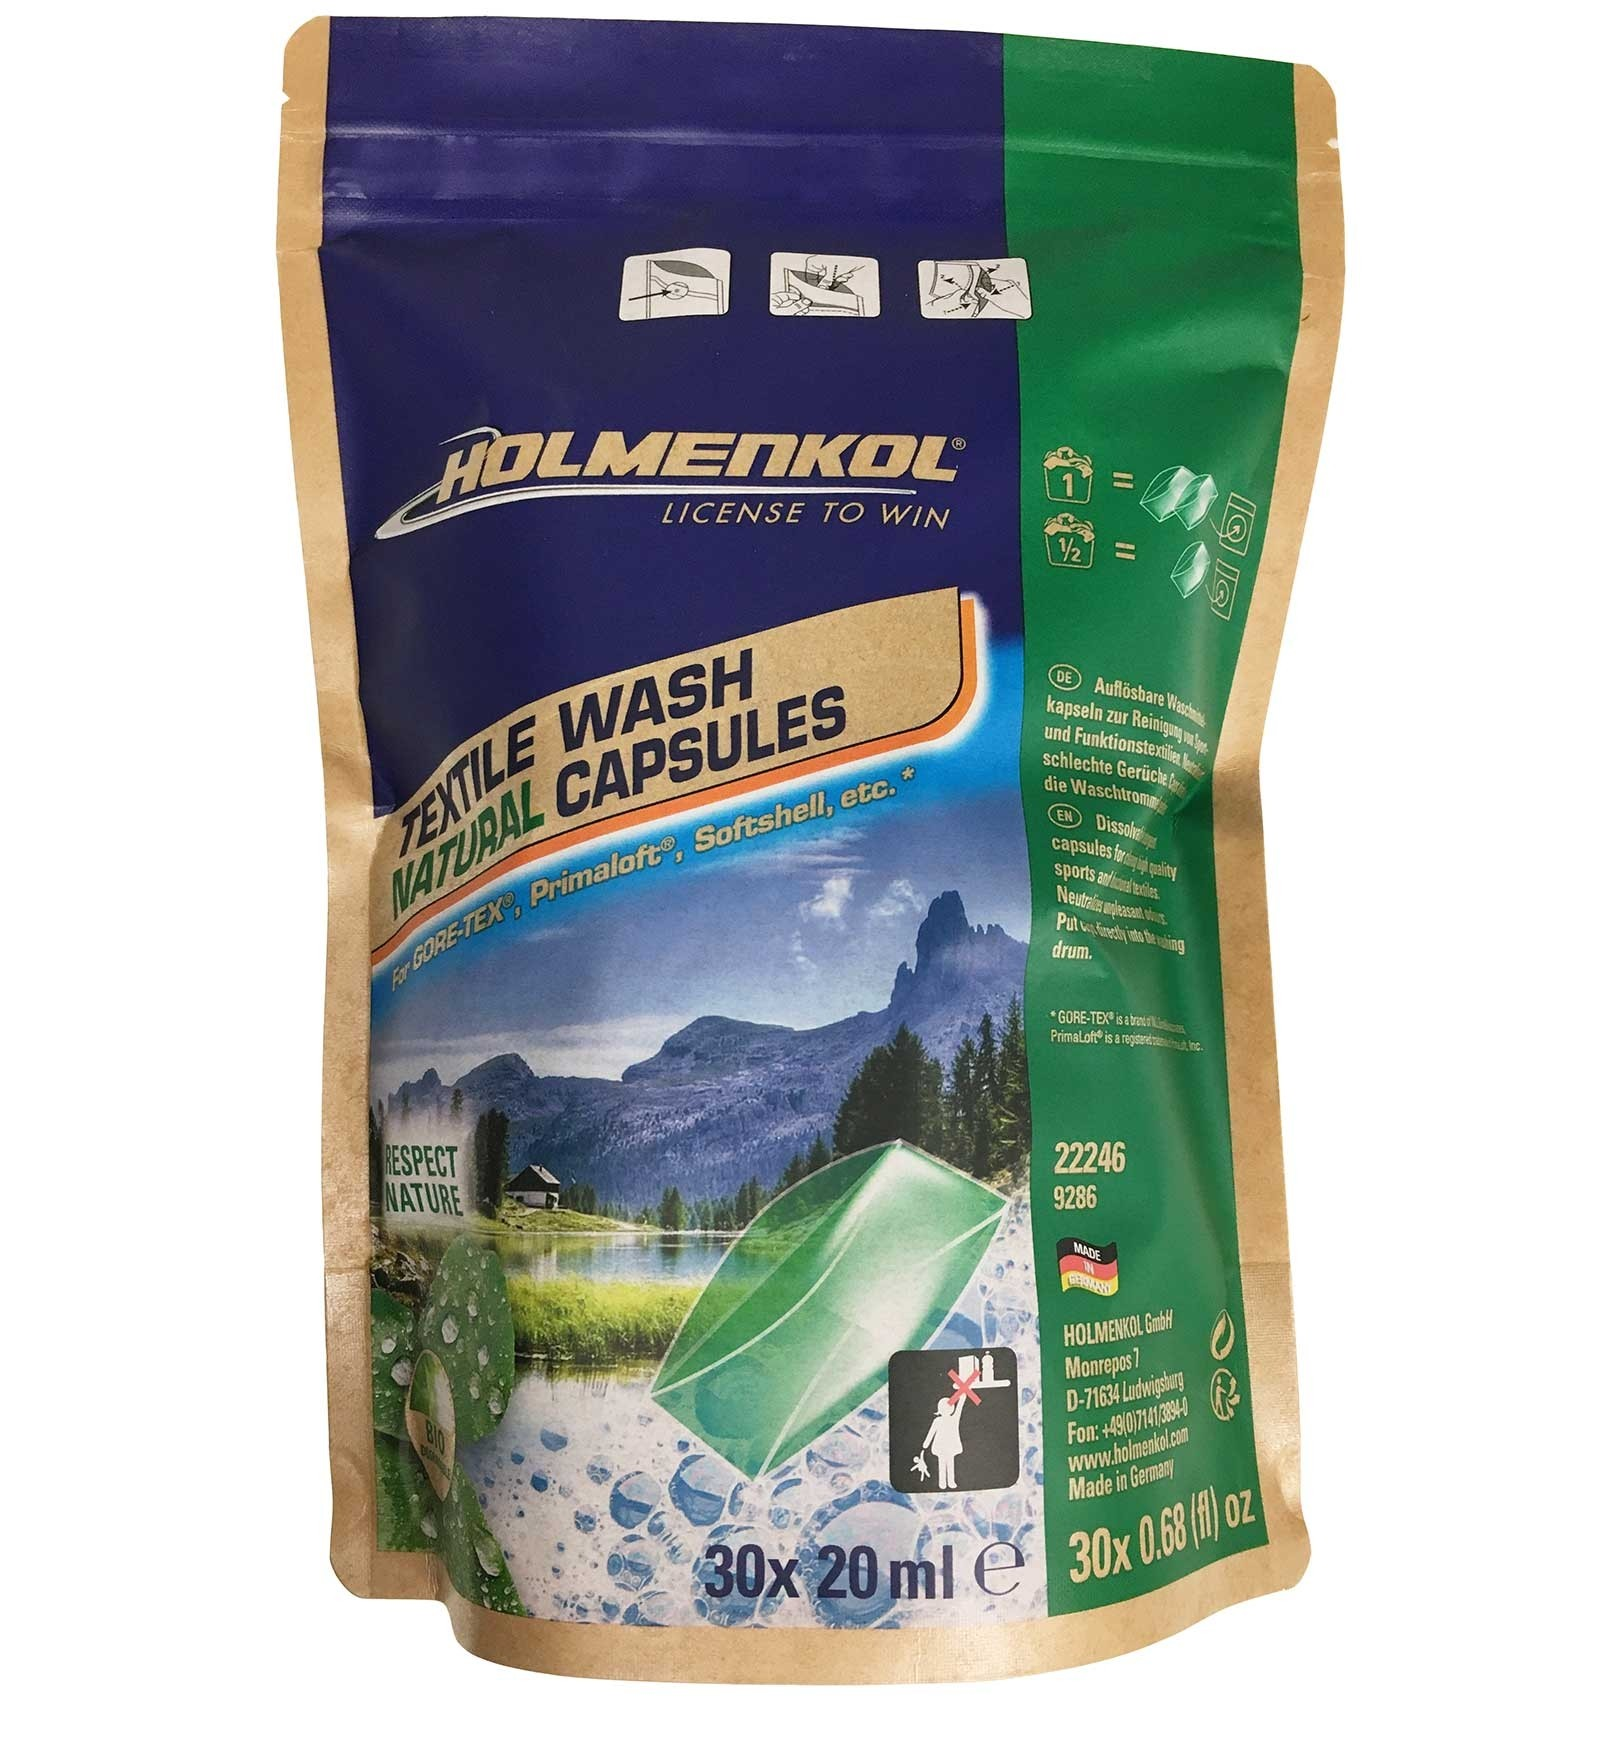 Holmenkol Textile Wash Natural Capsules 30